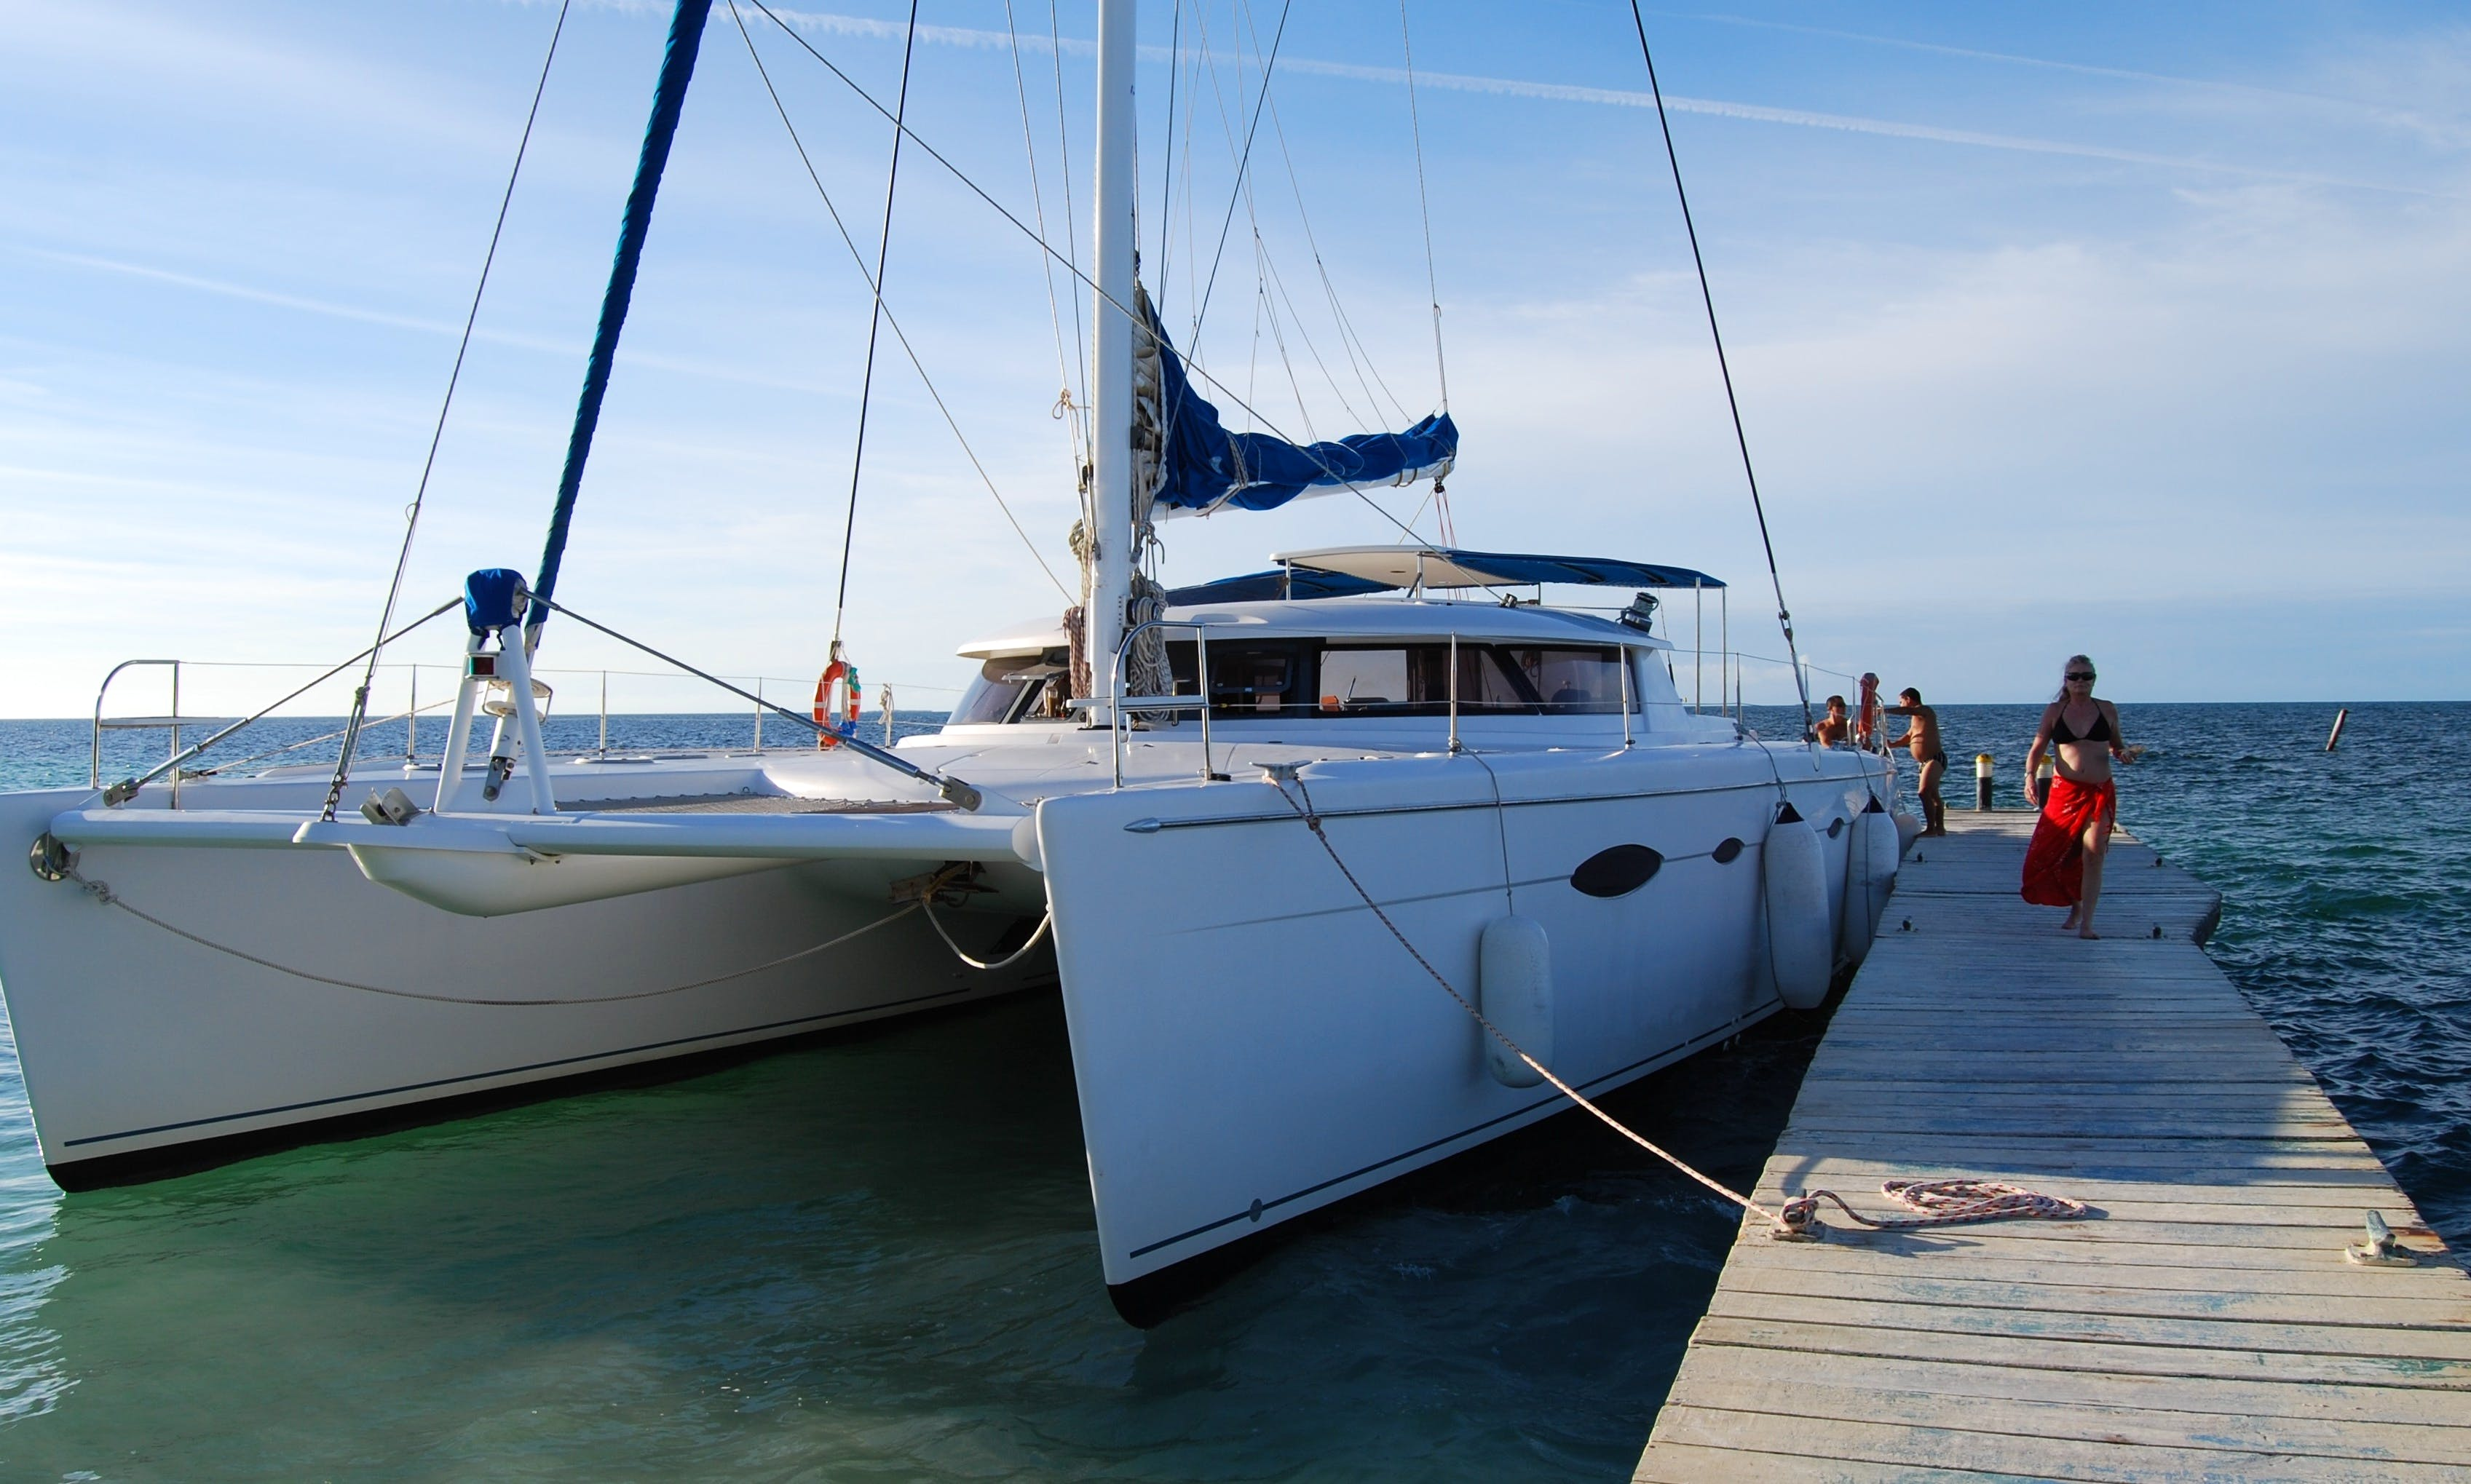 Andromeda 60 feet, Sailing Catamaran in Varadero, Cuba